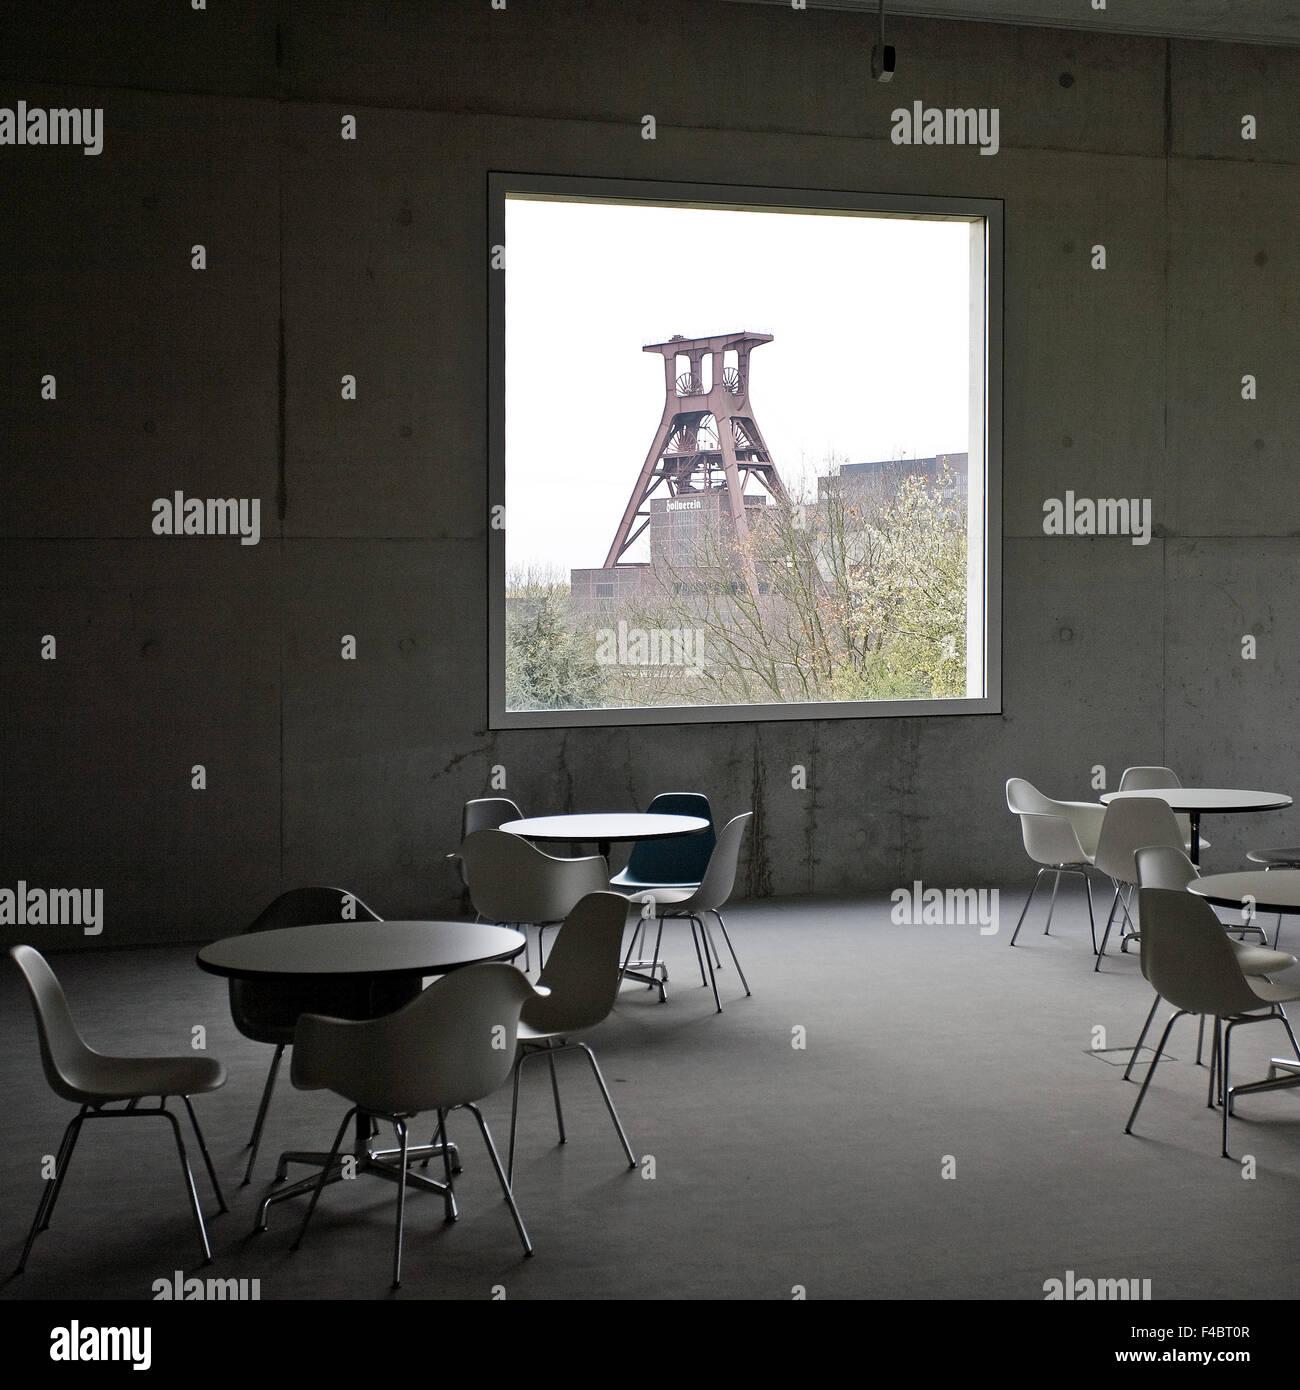 Zollverein cube, Essen, Germany - Stock Image